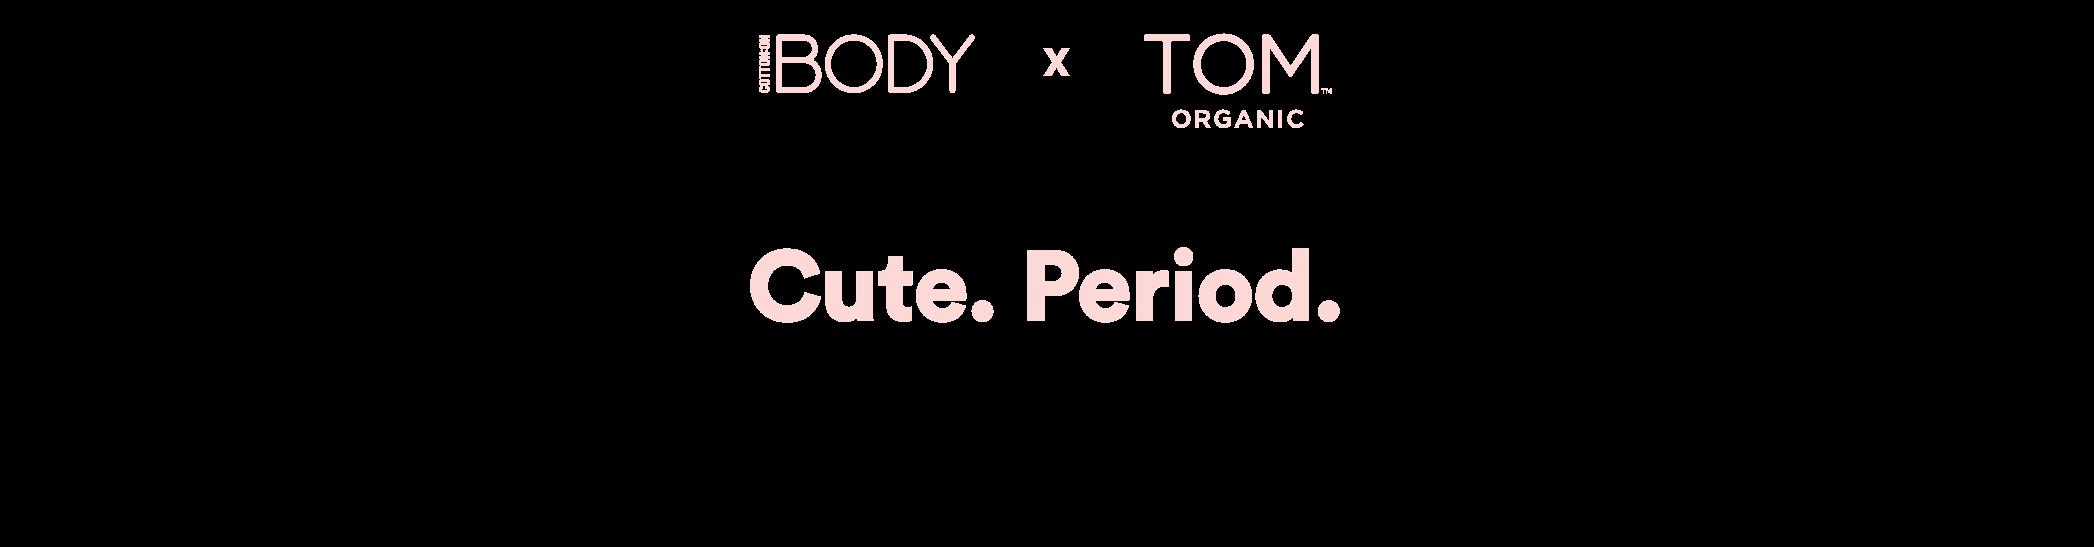 Cotton On Body X Tom Organic. Period Undies.